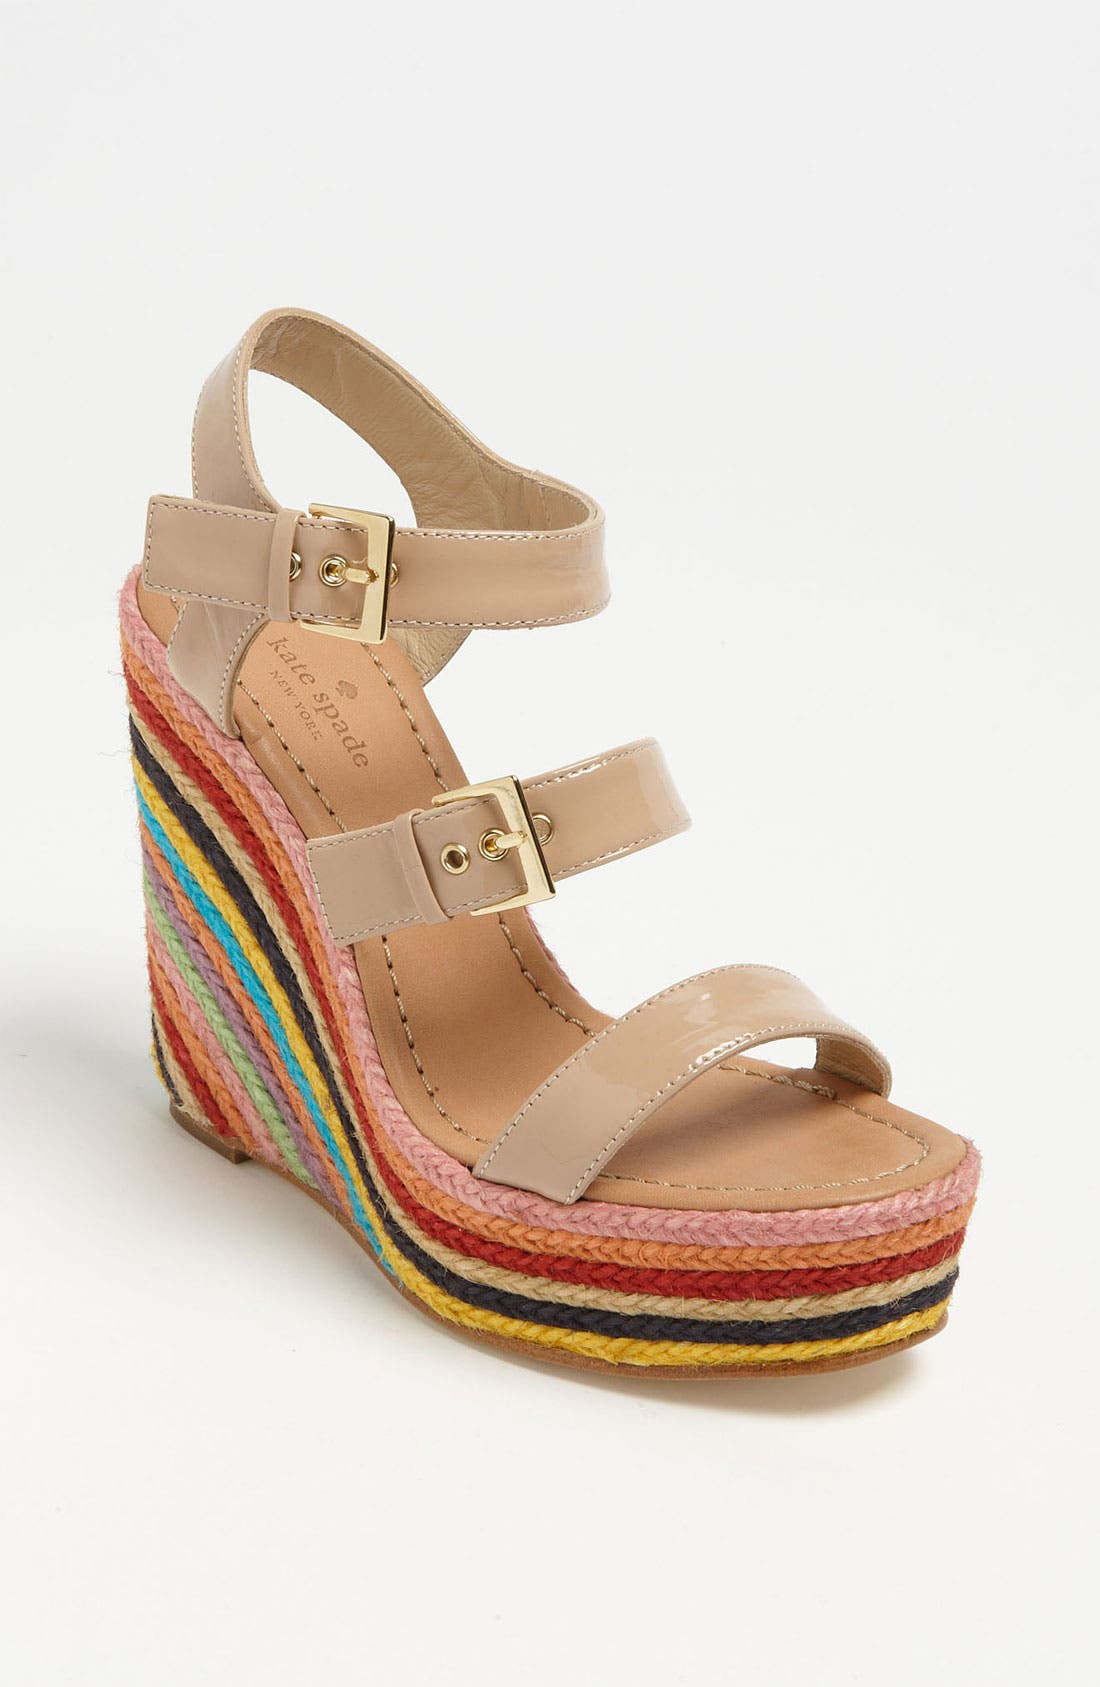 Alternate Image 1 Selected - kate spade new york 'lucie' espadrille sandal